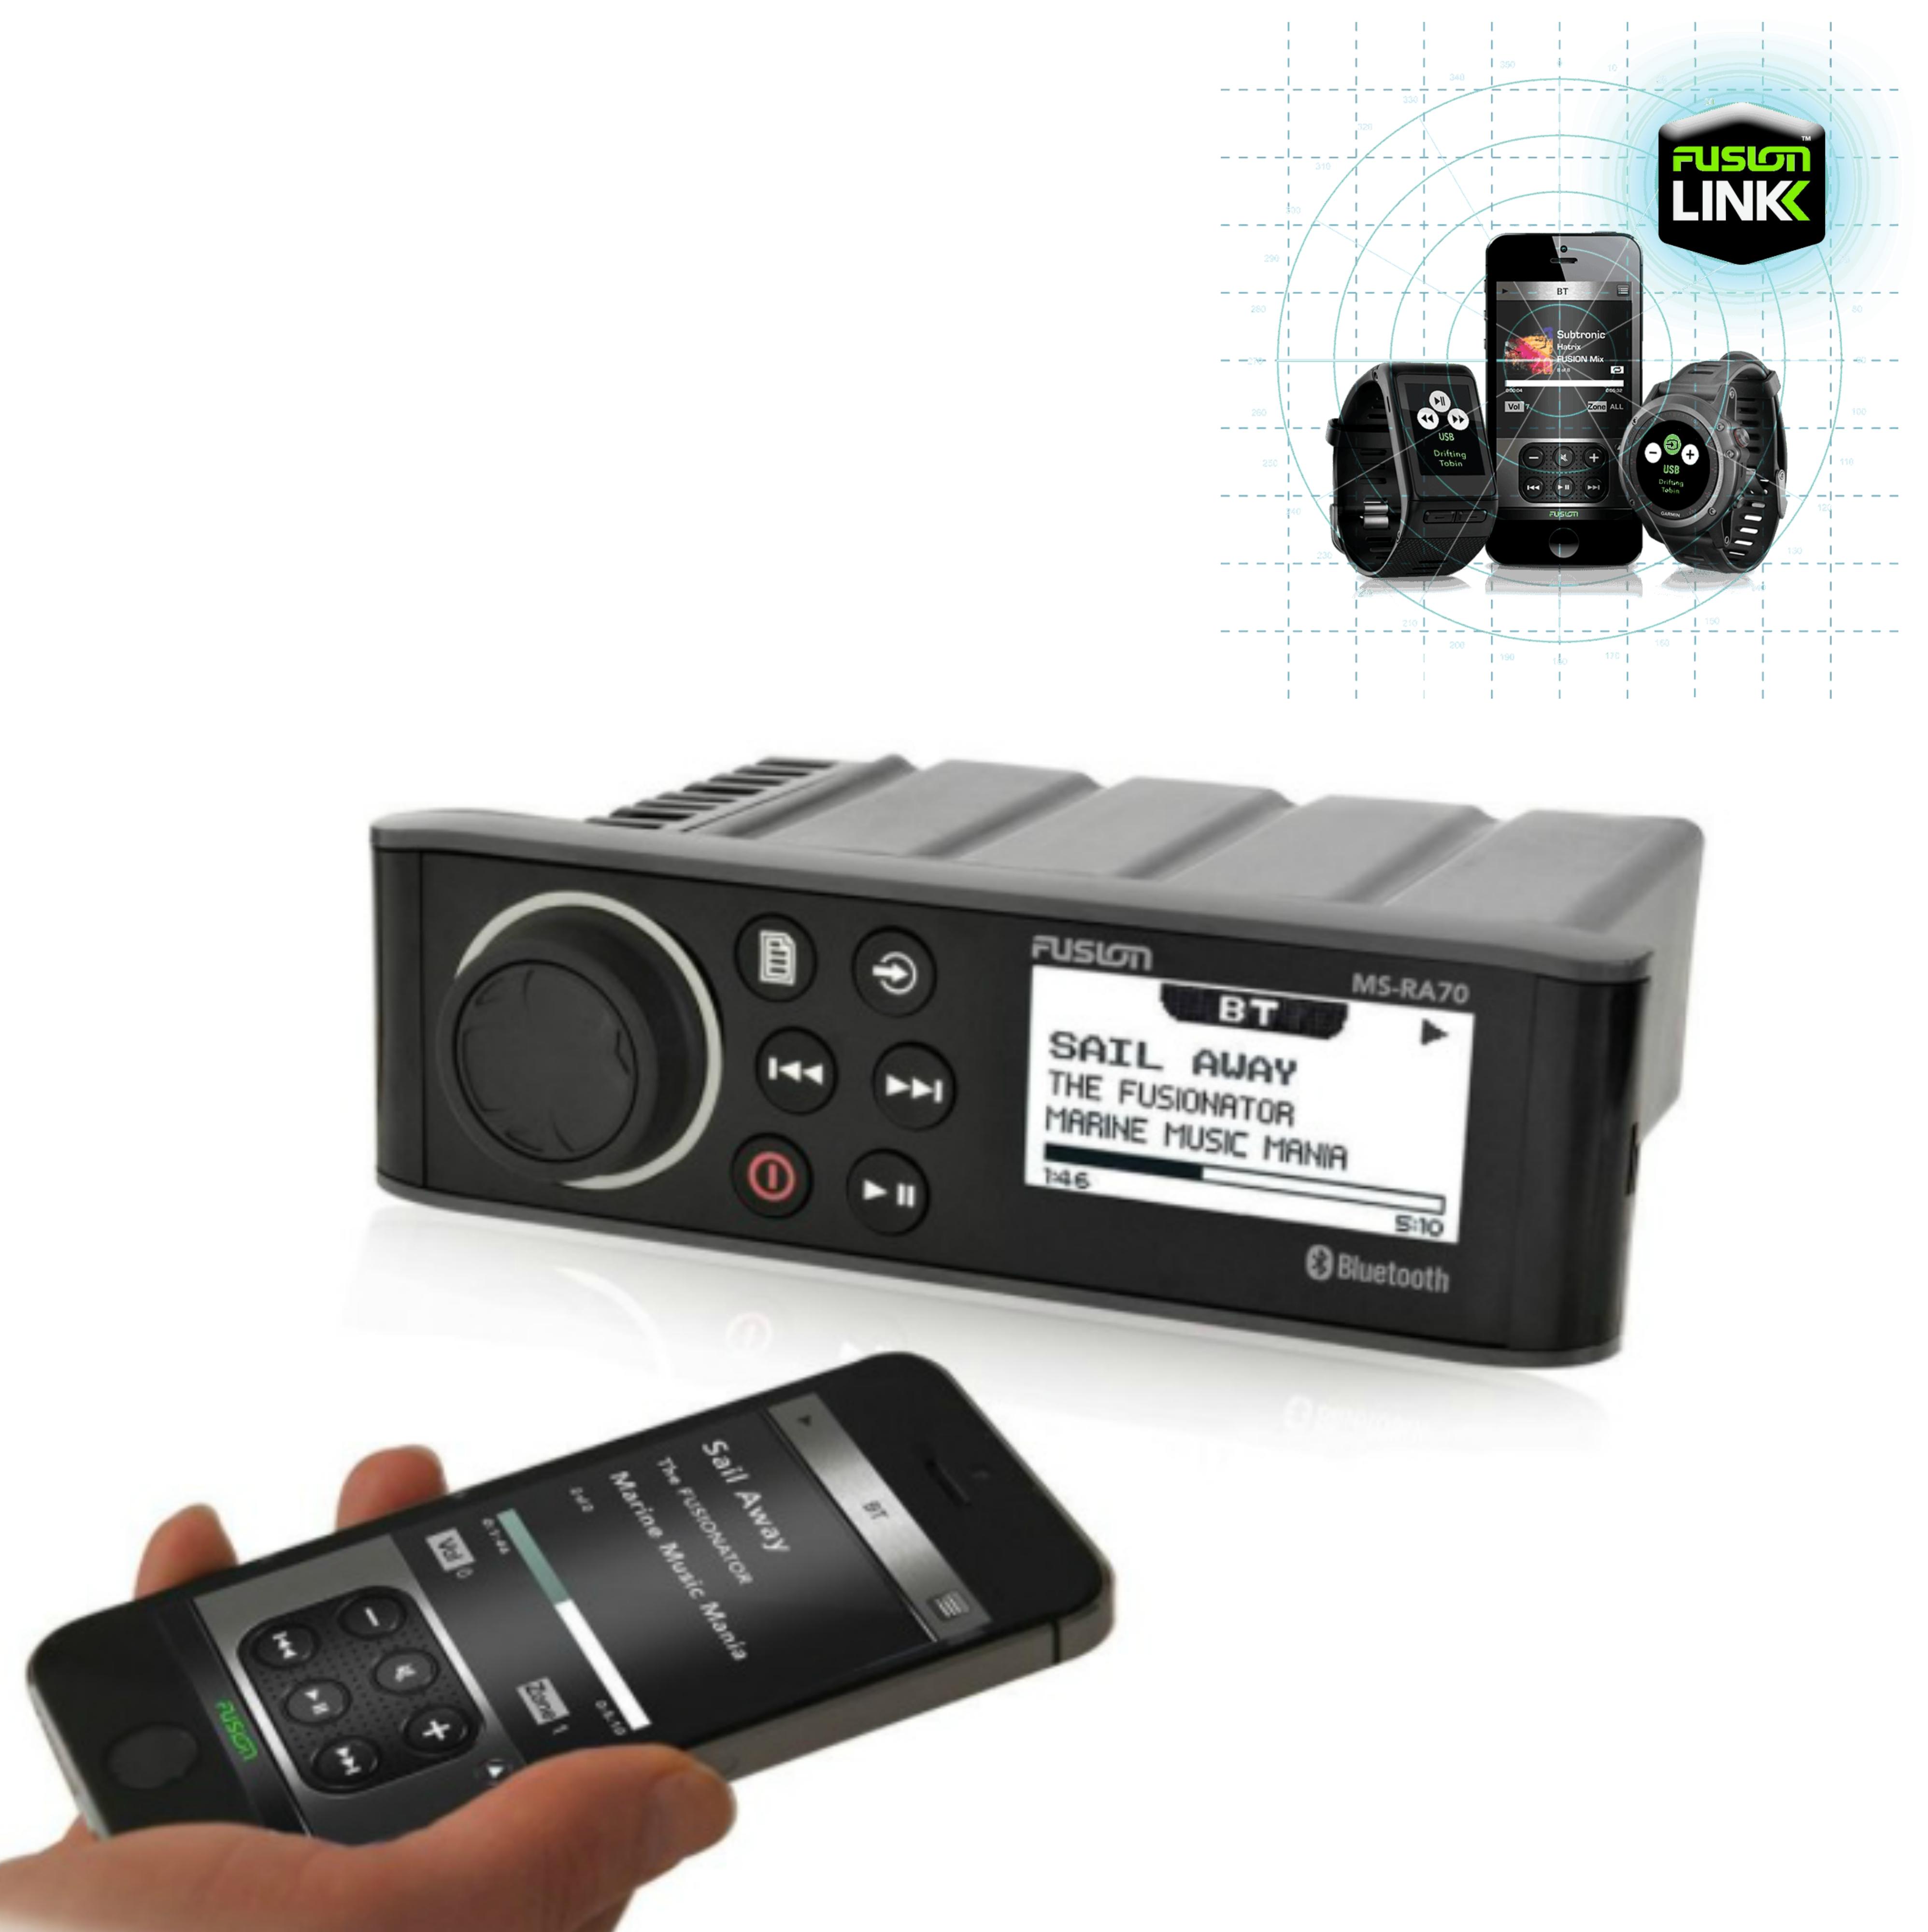 Fusion RA70 Marine Radio Source Unit|FM/AM/DAB|USB/Bluetooth|iPod/iPhone/Android